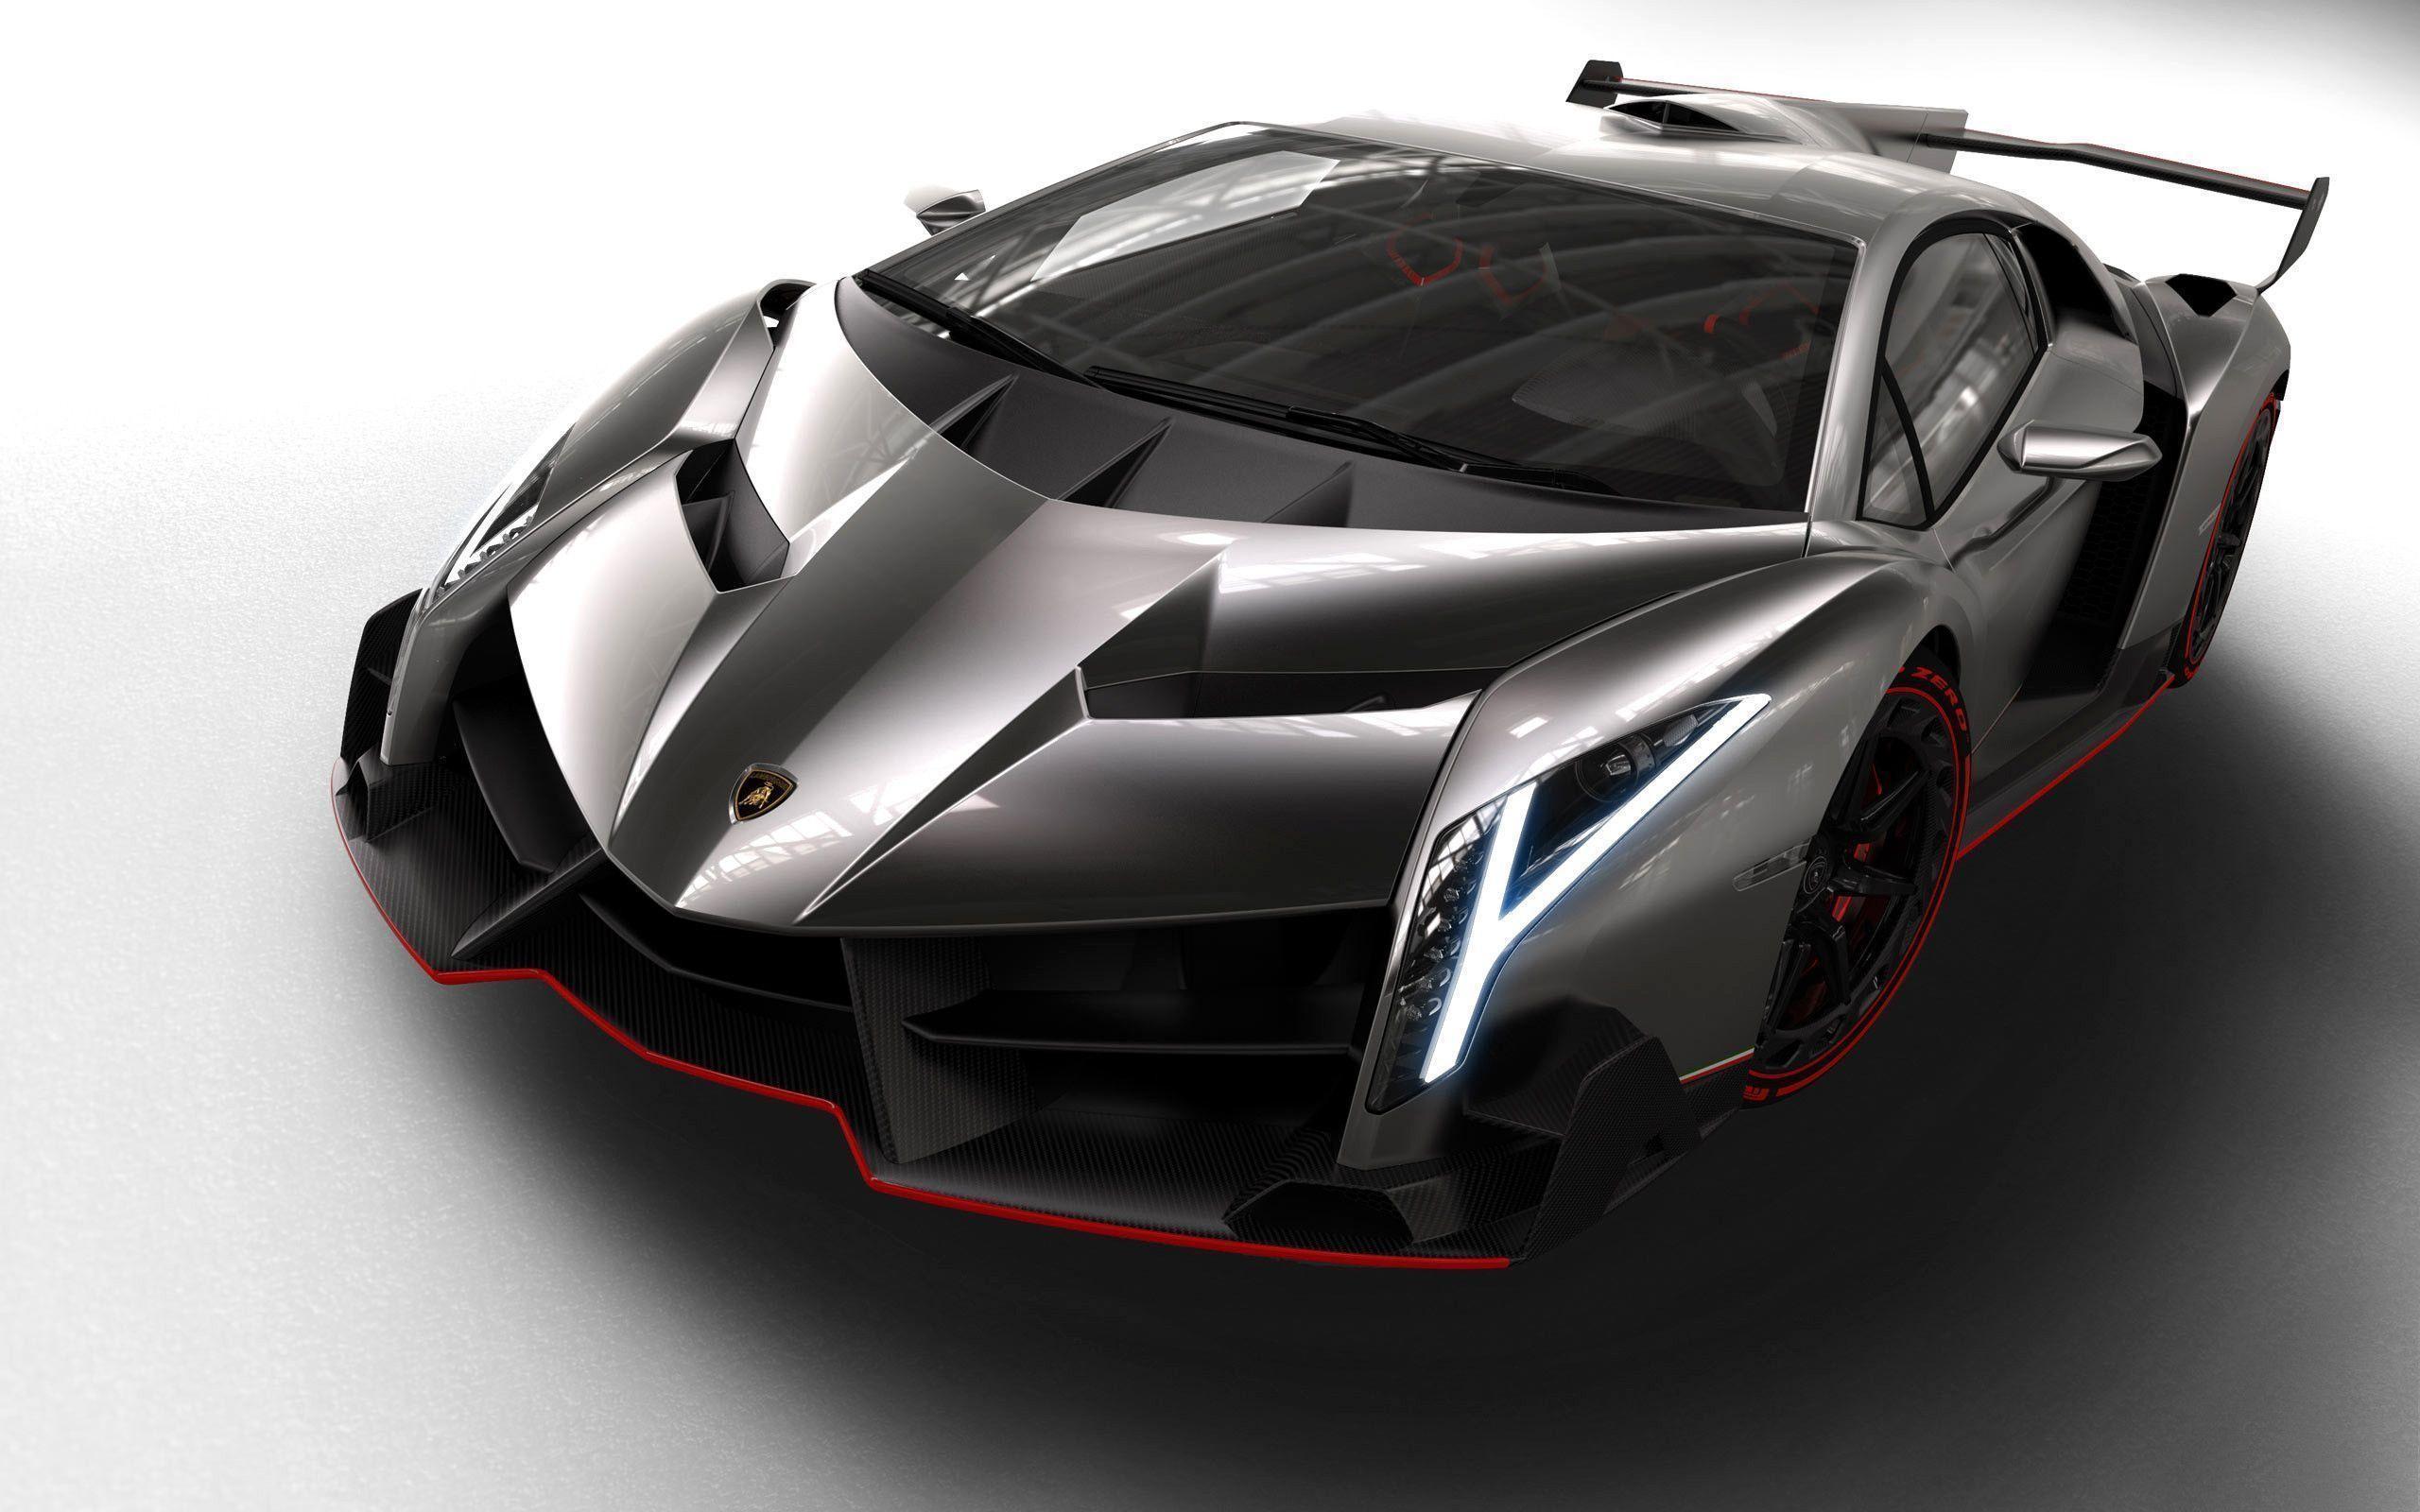 Res: 2560x1600, Lamborghini Veneno Wallpapers | HD Wallpapers